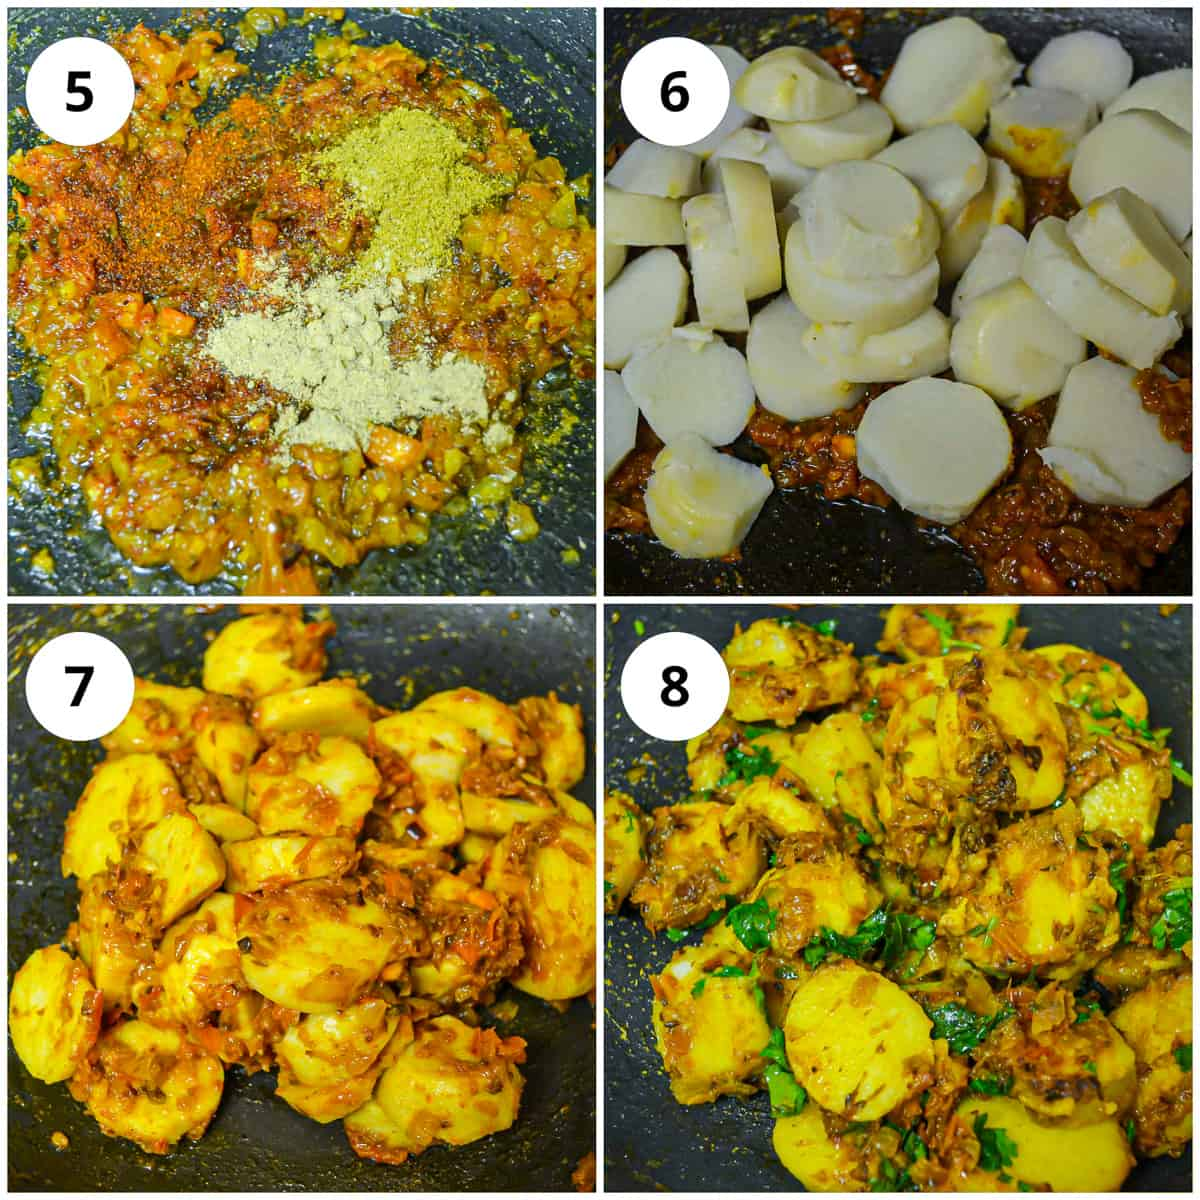 step by step photos to show how to make the arbi ki sabzi